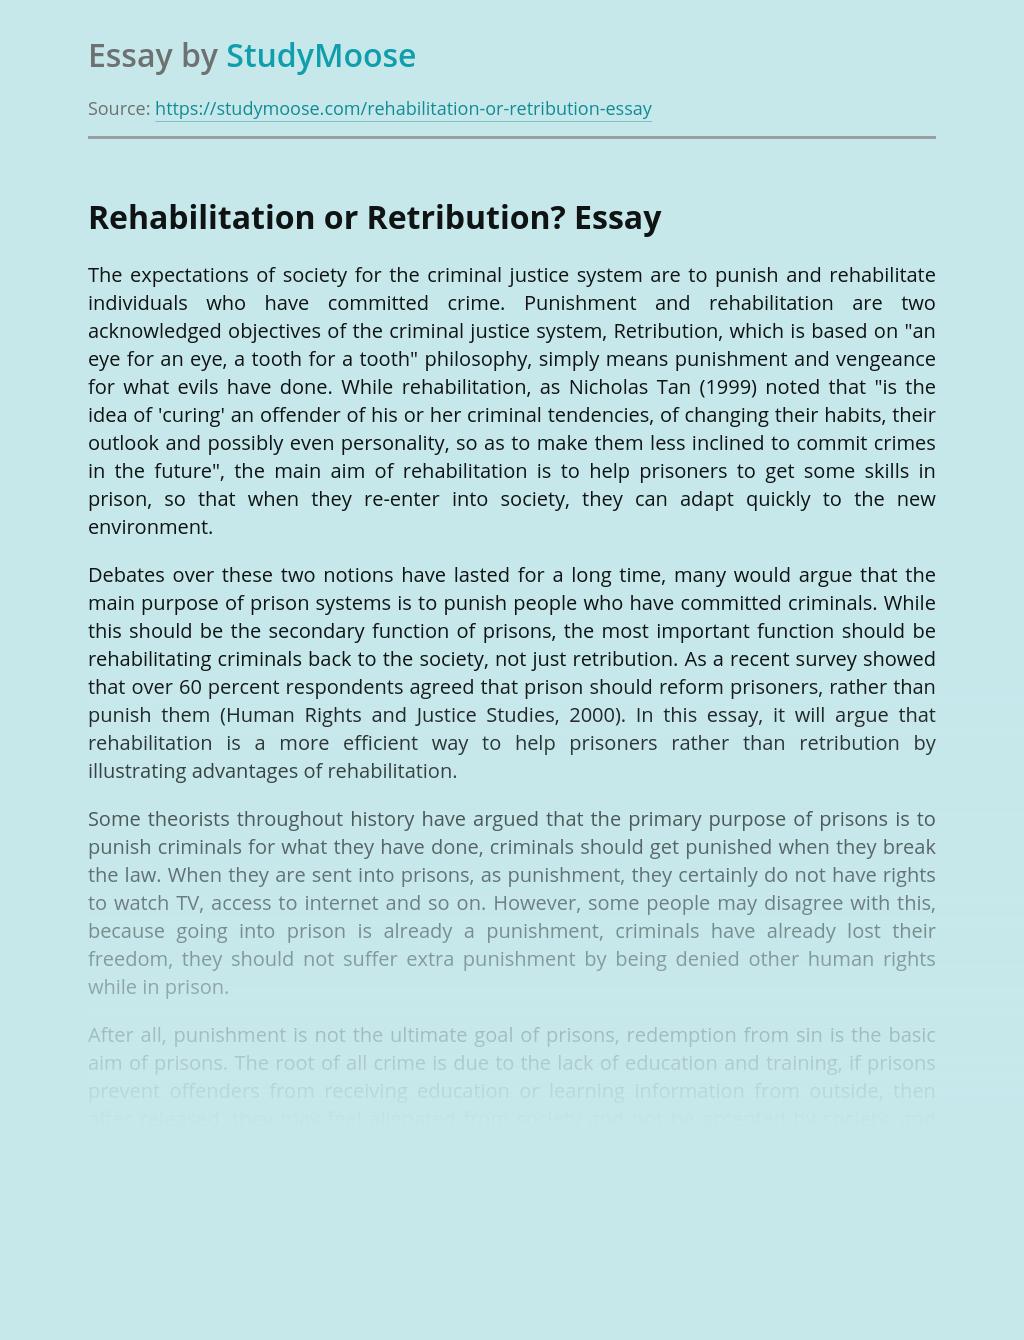 Rehabilitation or Retribution